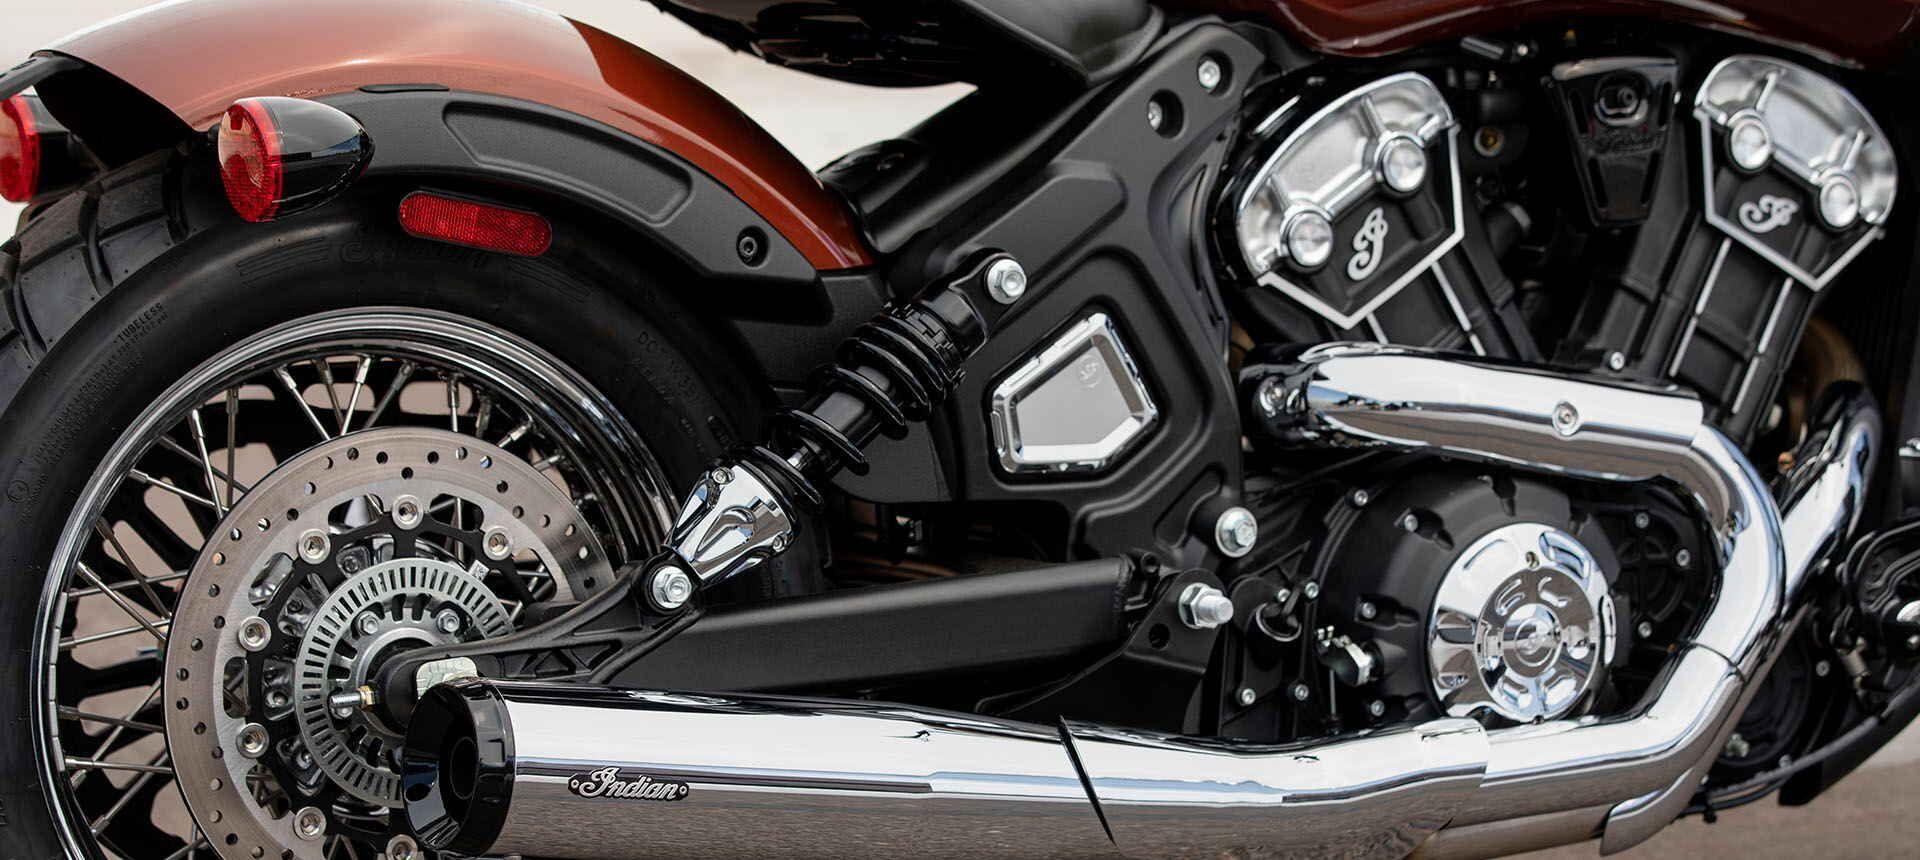 Мотоцикл Indian Scout Bobber Twenty Burnished Metallic 2020 - 7